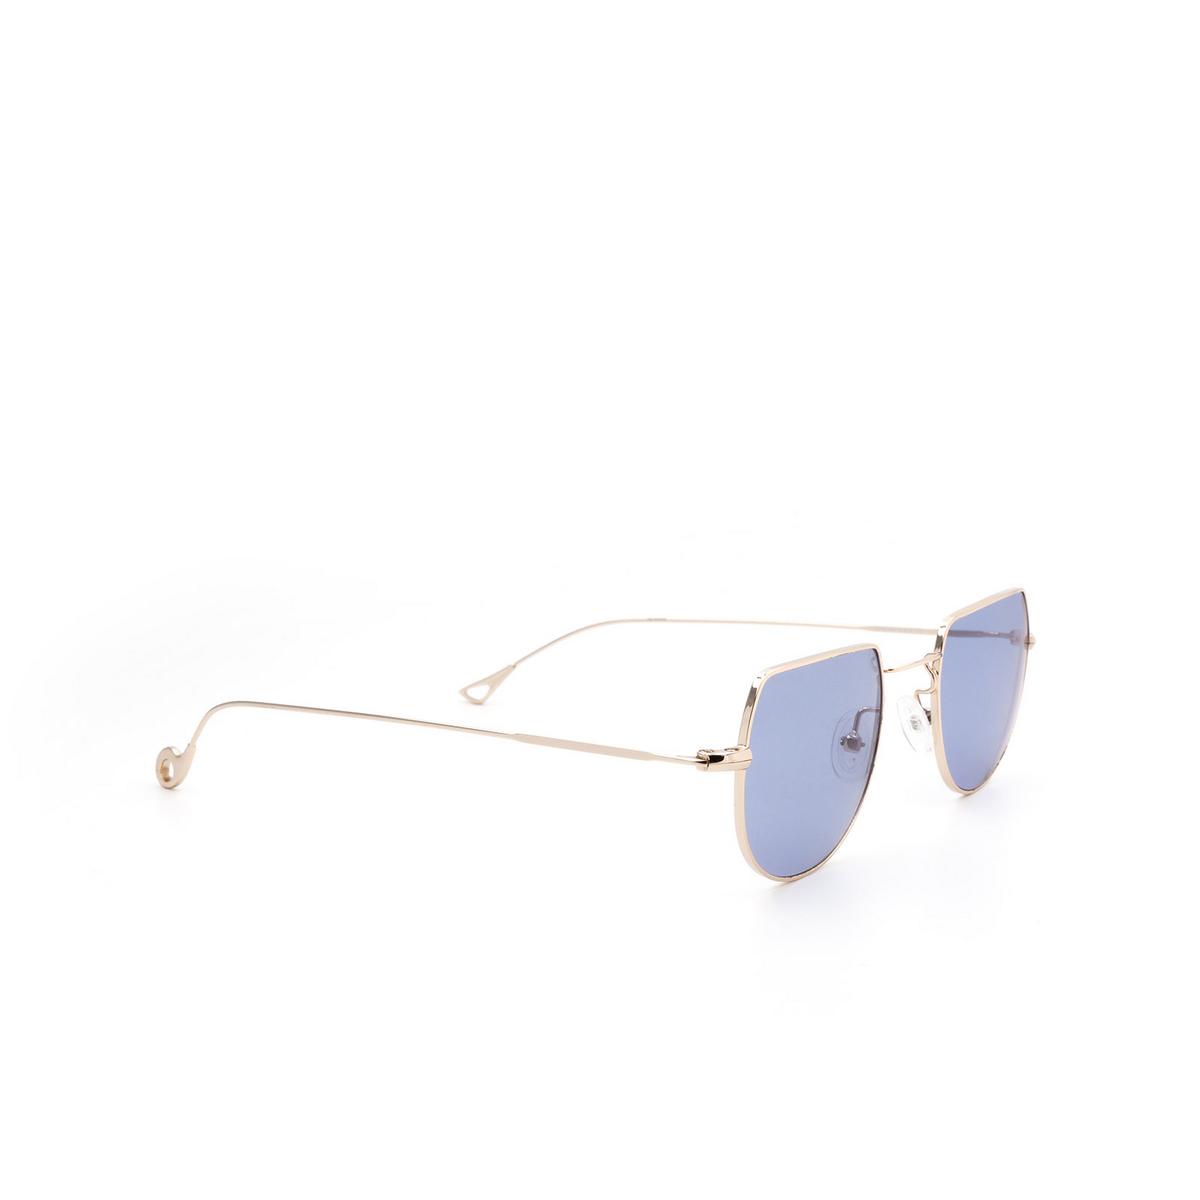 eyepetizer-vendome-c-2-1 (1)